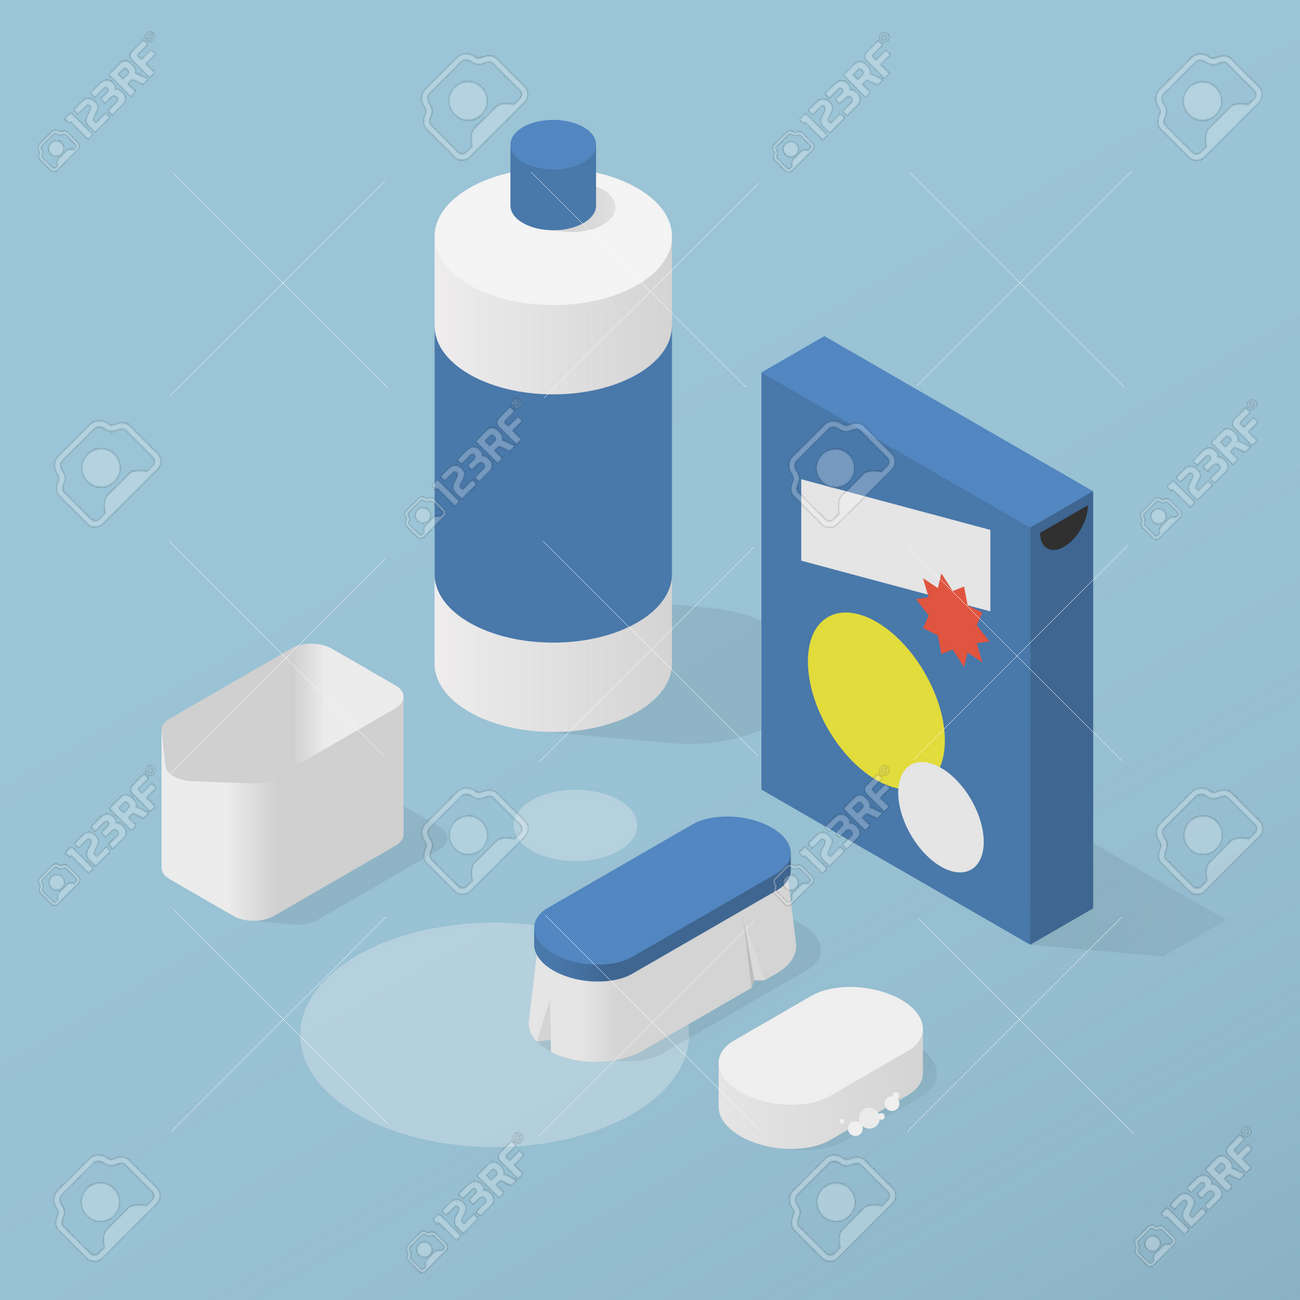 Household Chemicals Isometric Illustration - 172855428